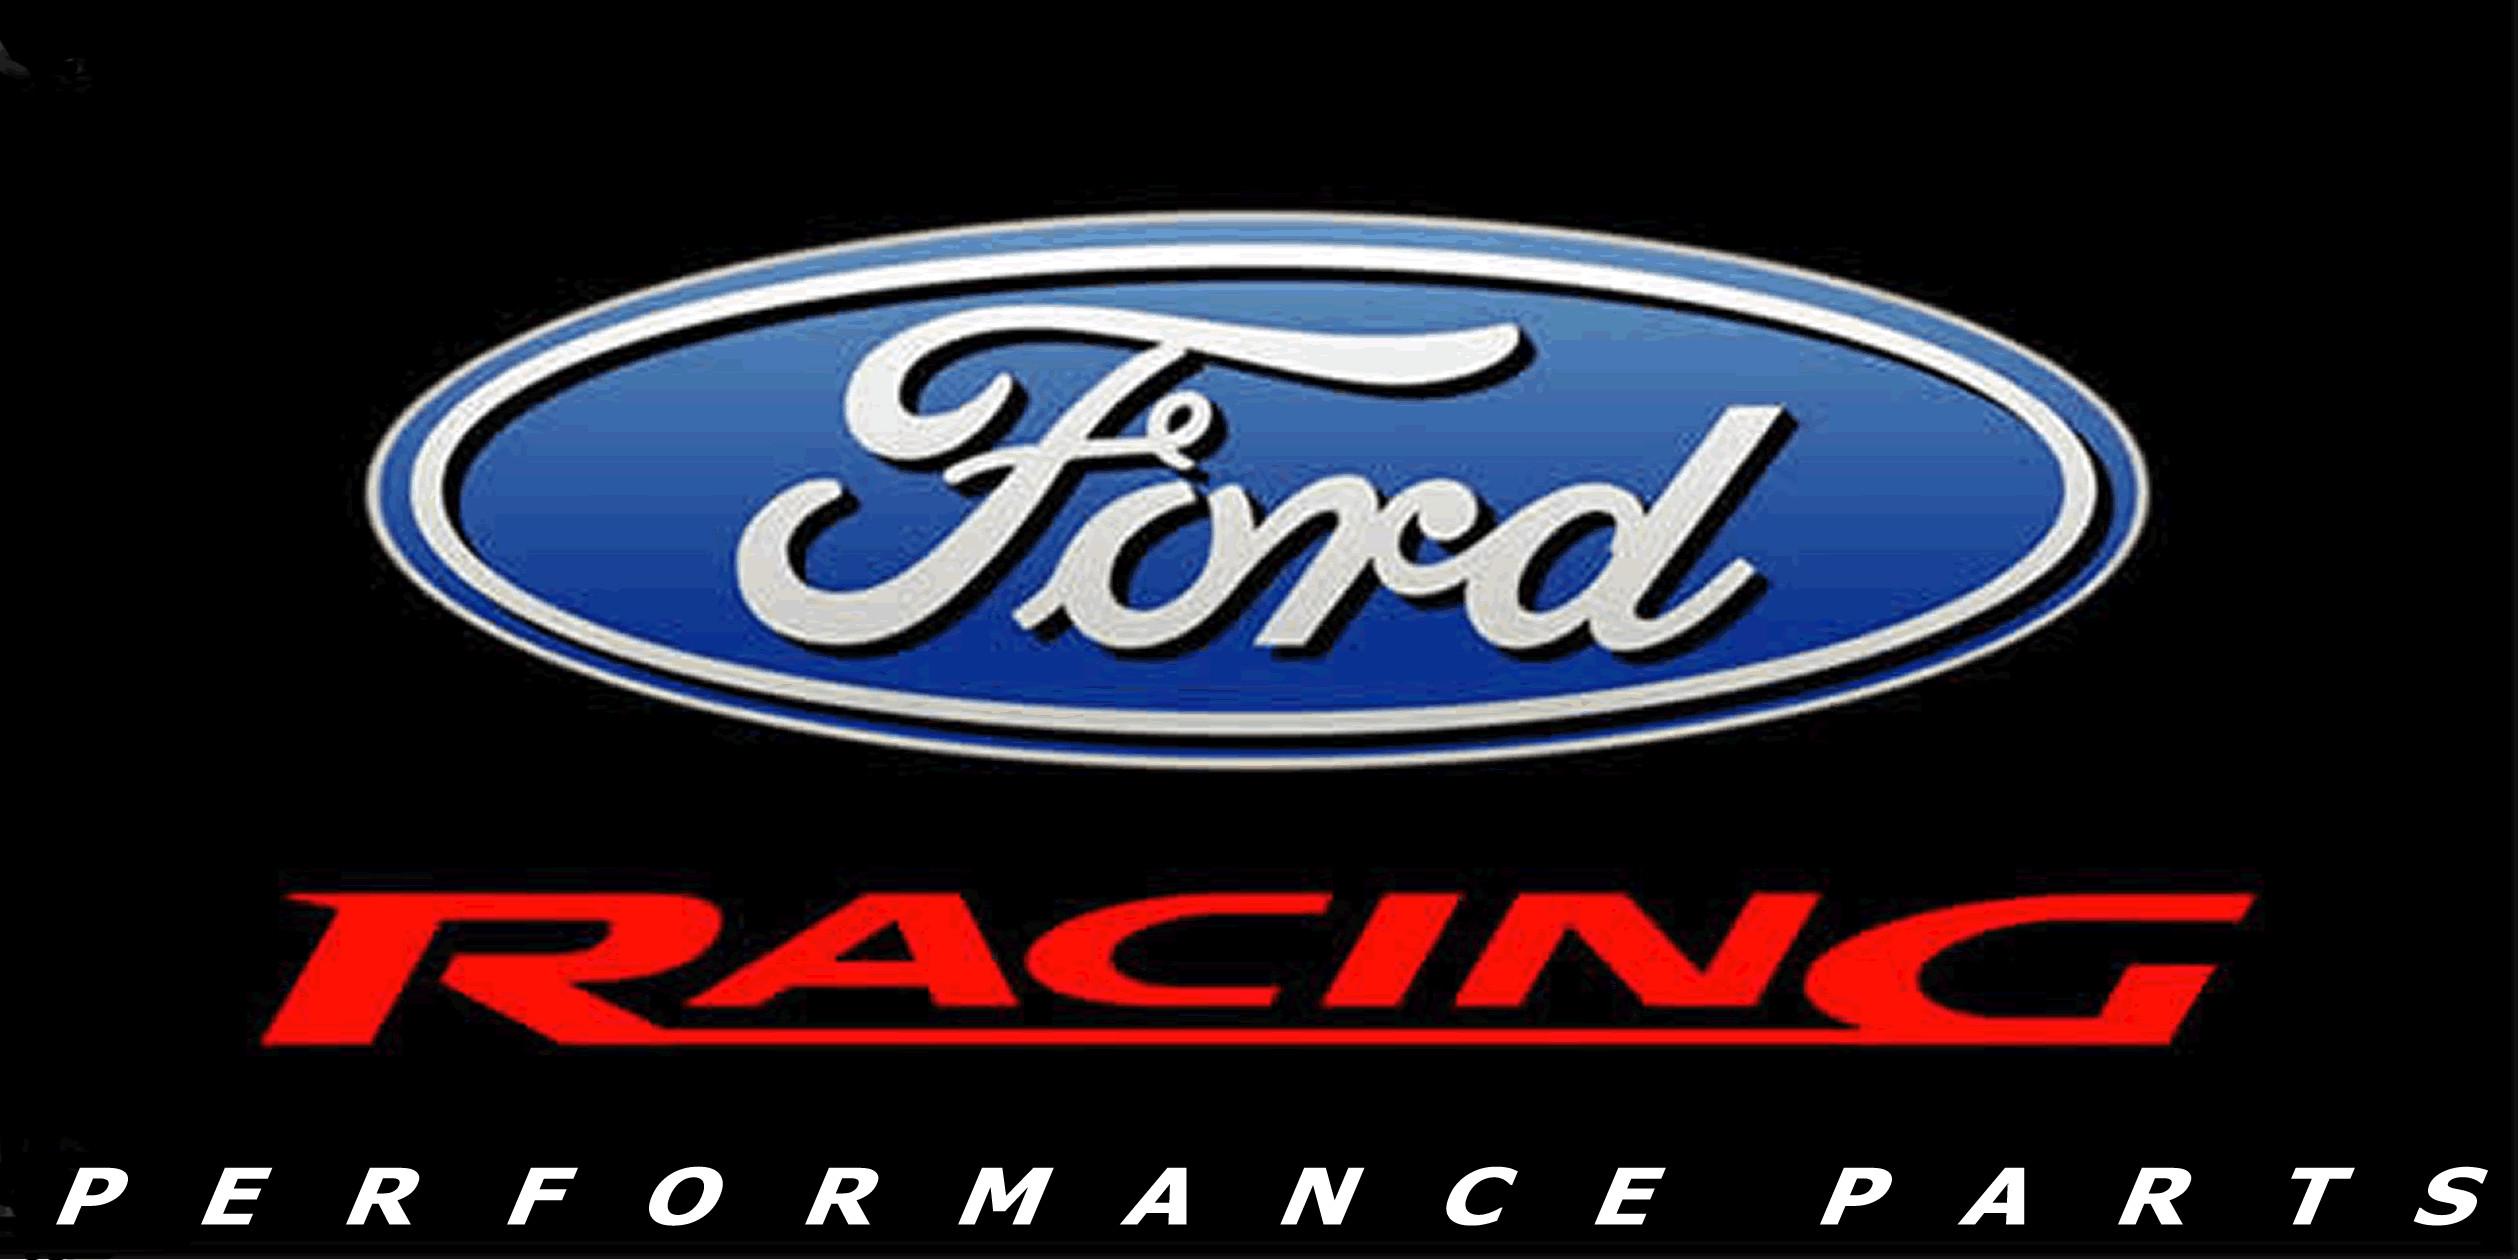 Free Ford Logo Wallpaper Choice Image - Wallpaper And Free